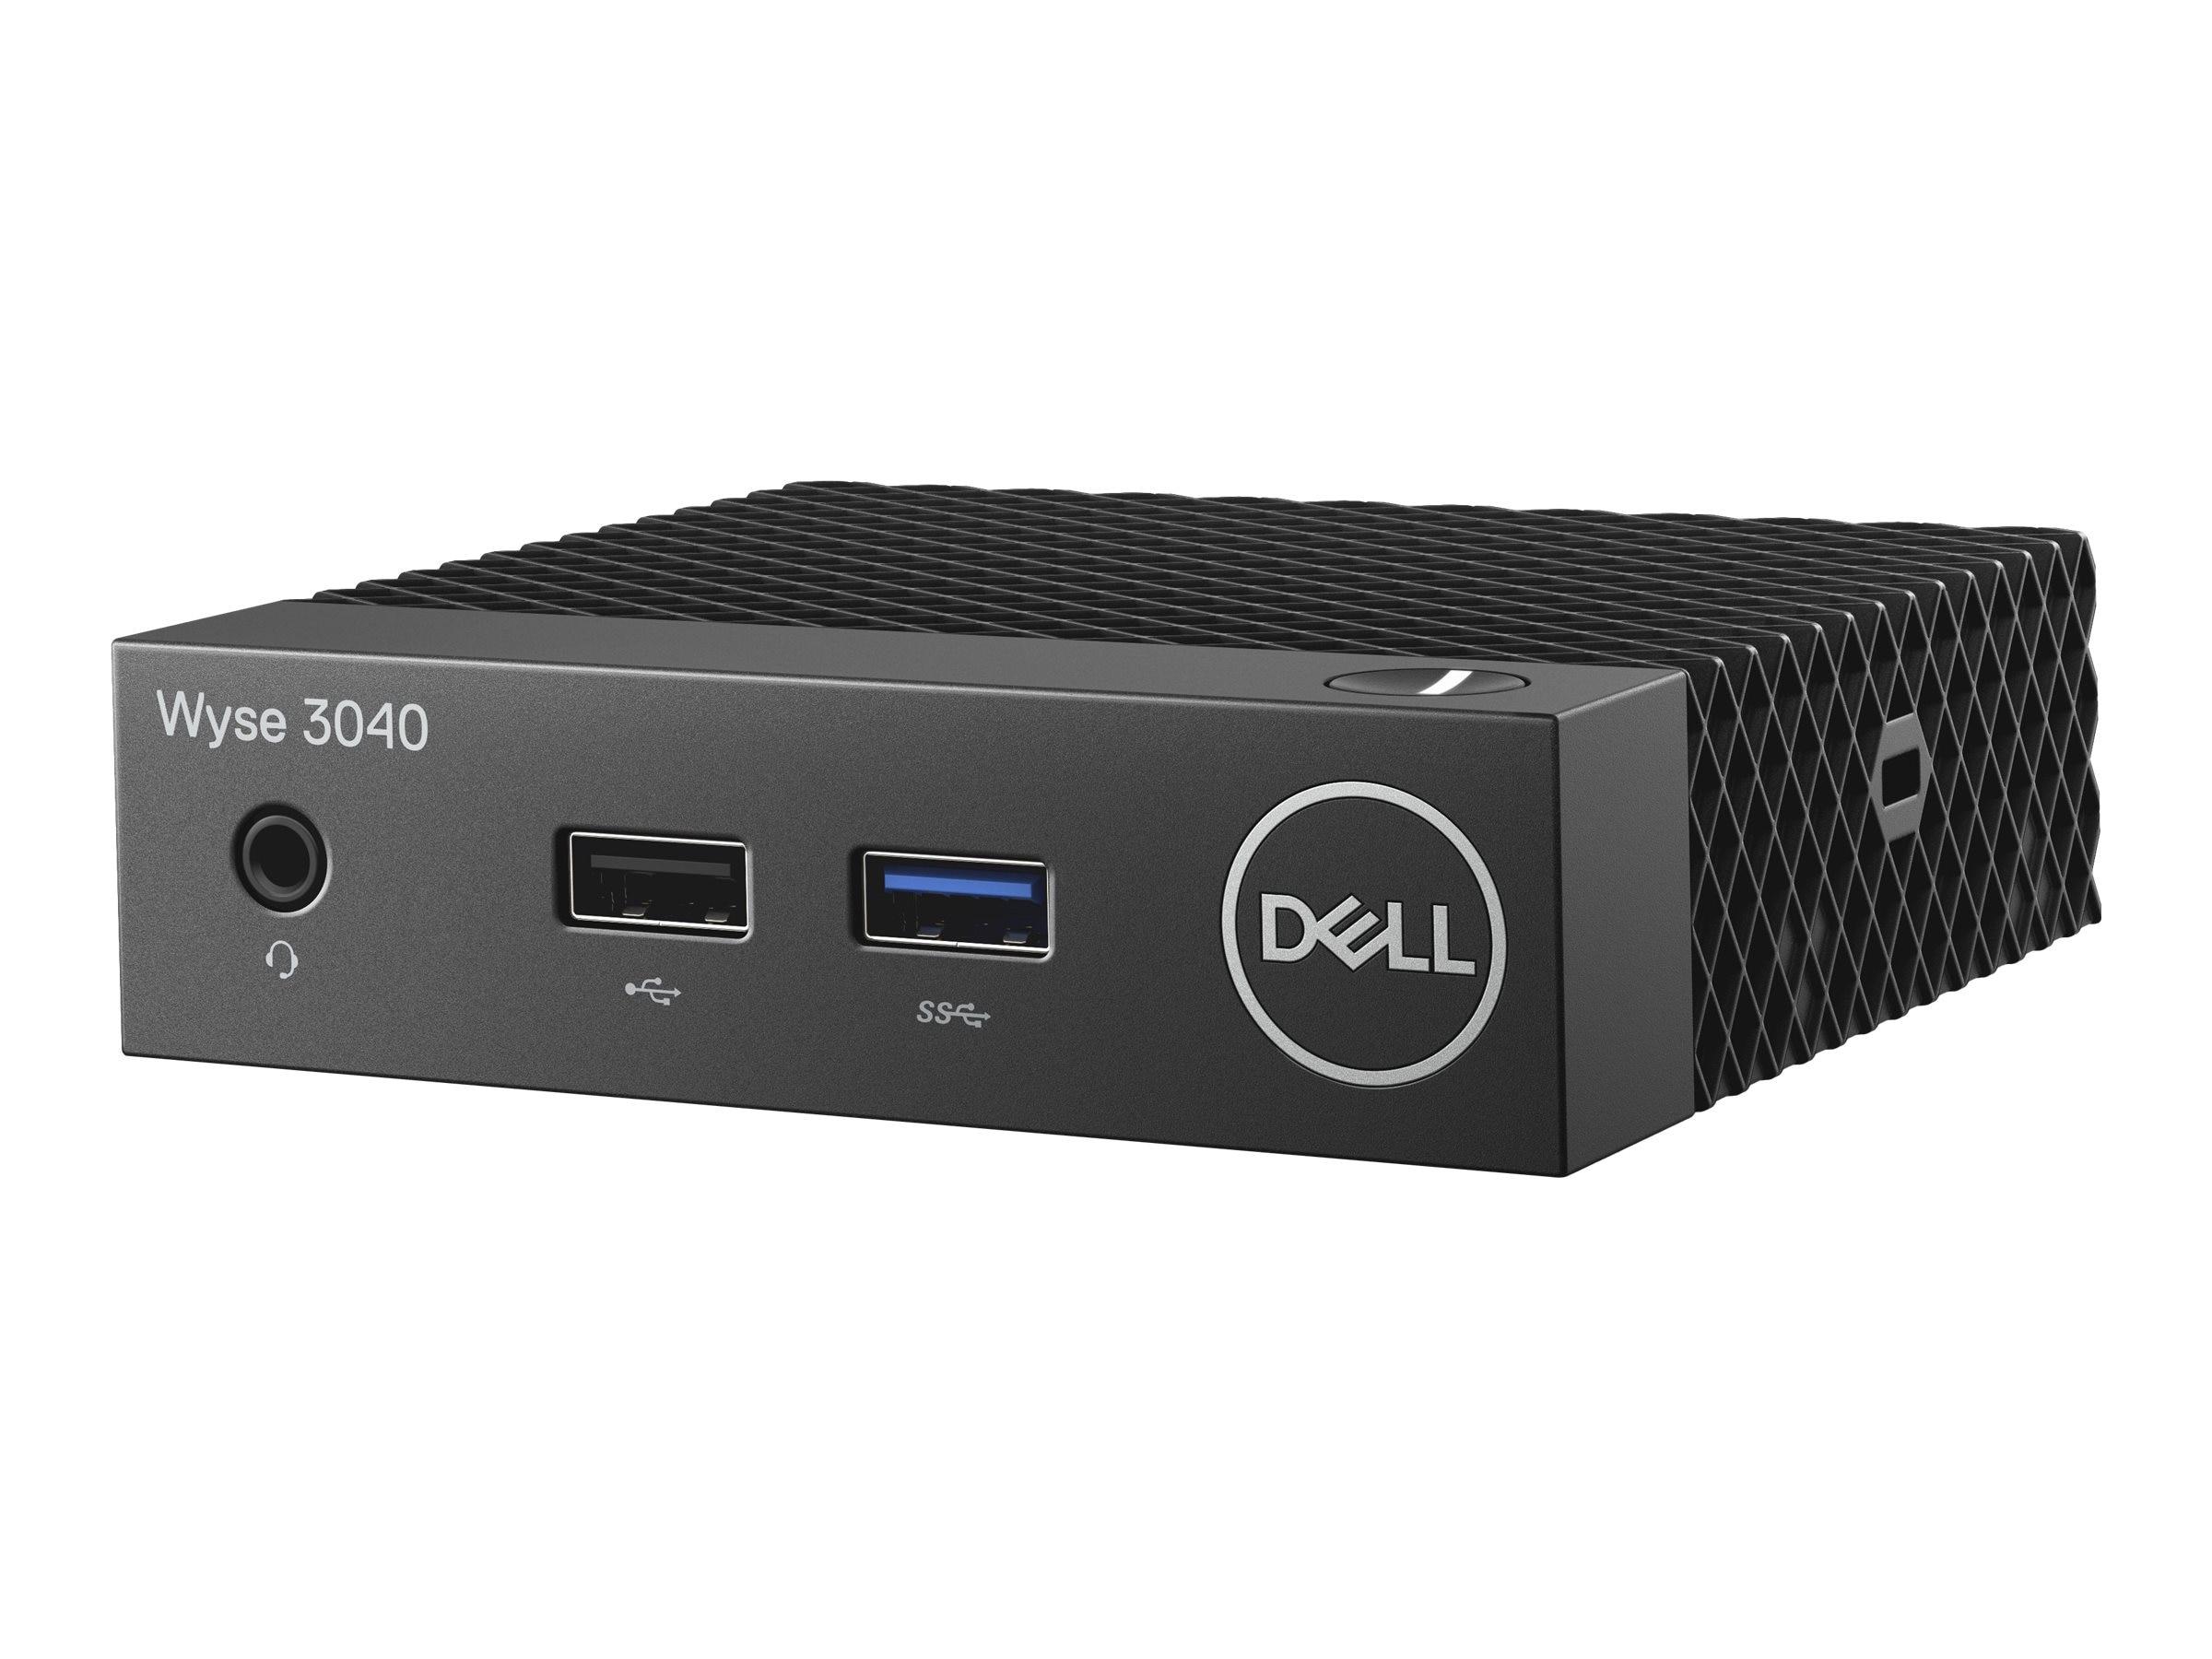 Wyse 3040 Thin Client Atom x5-Z8350 1 44GHz 2GB 8GB Flash ac GbE ThinOS 8 3